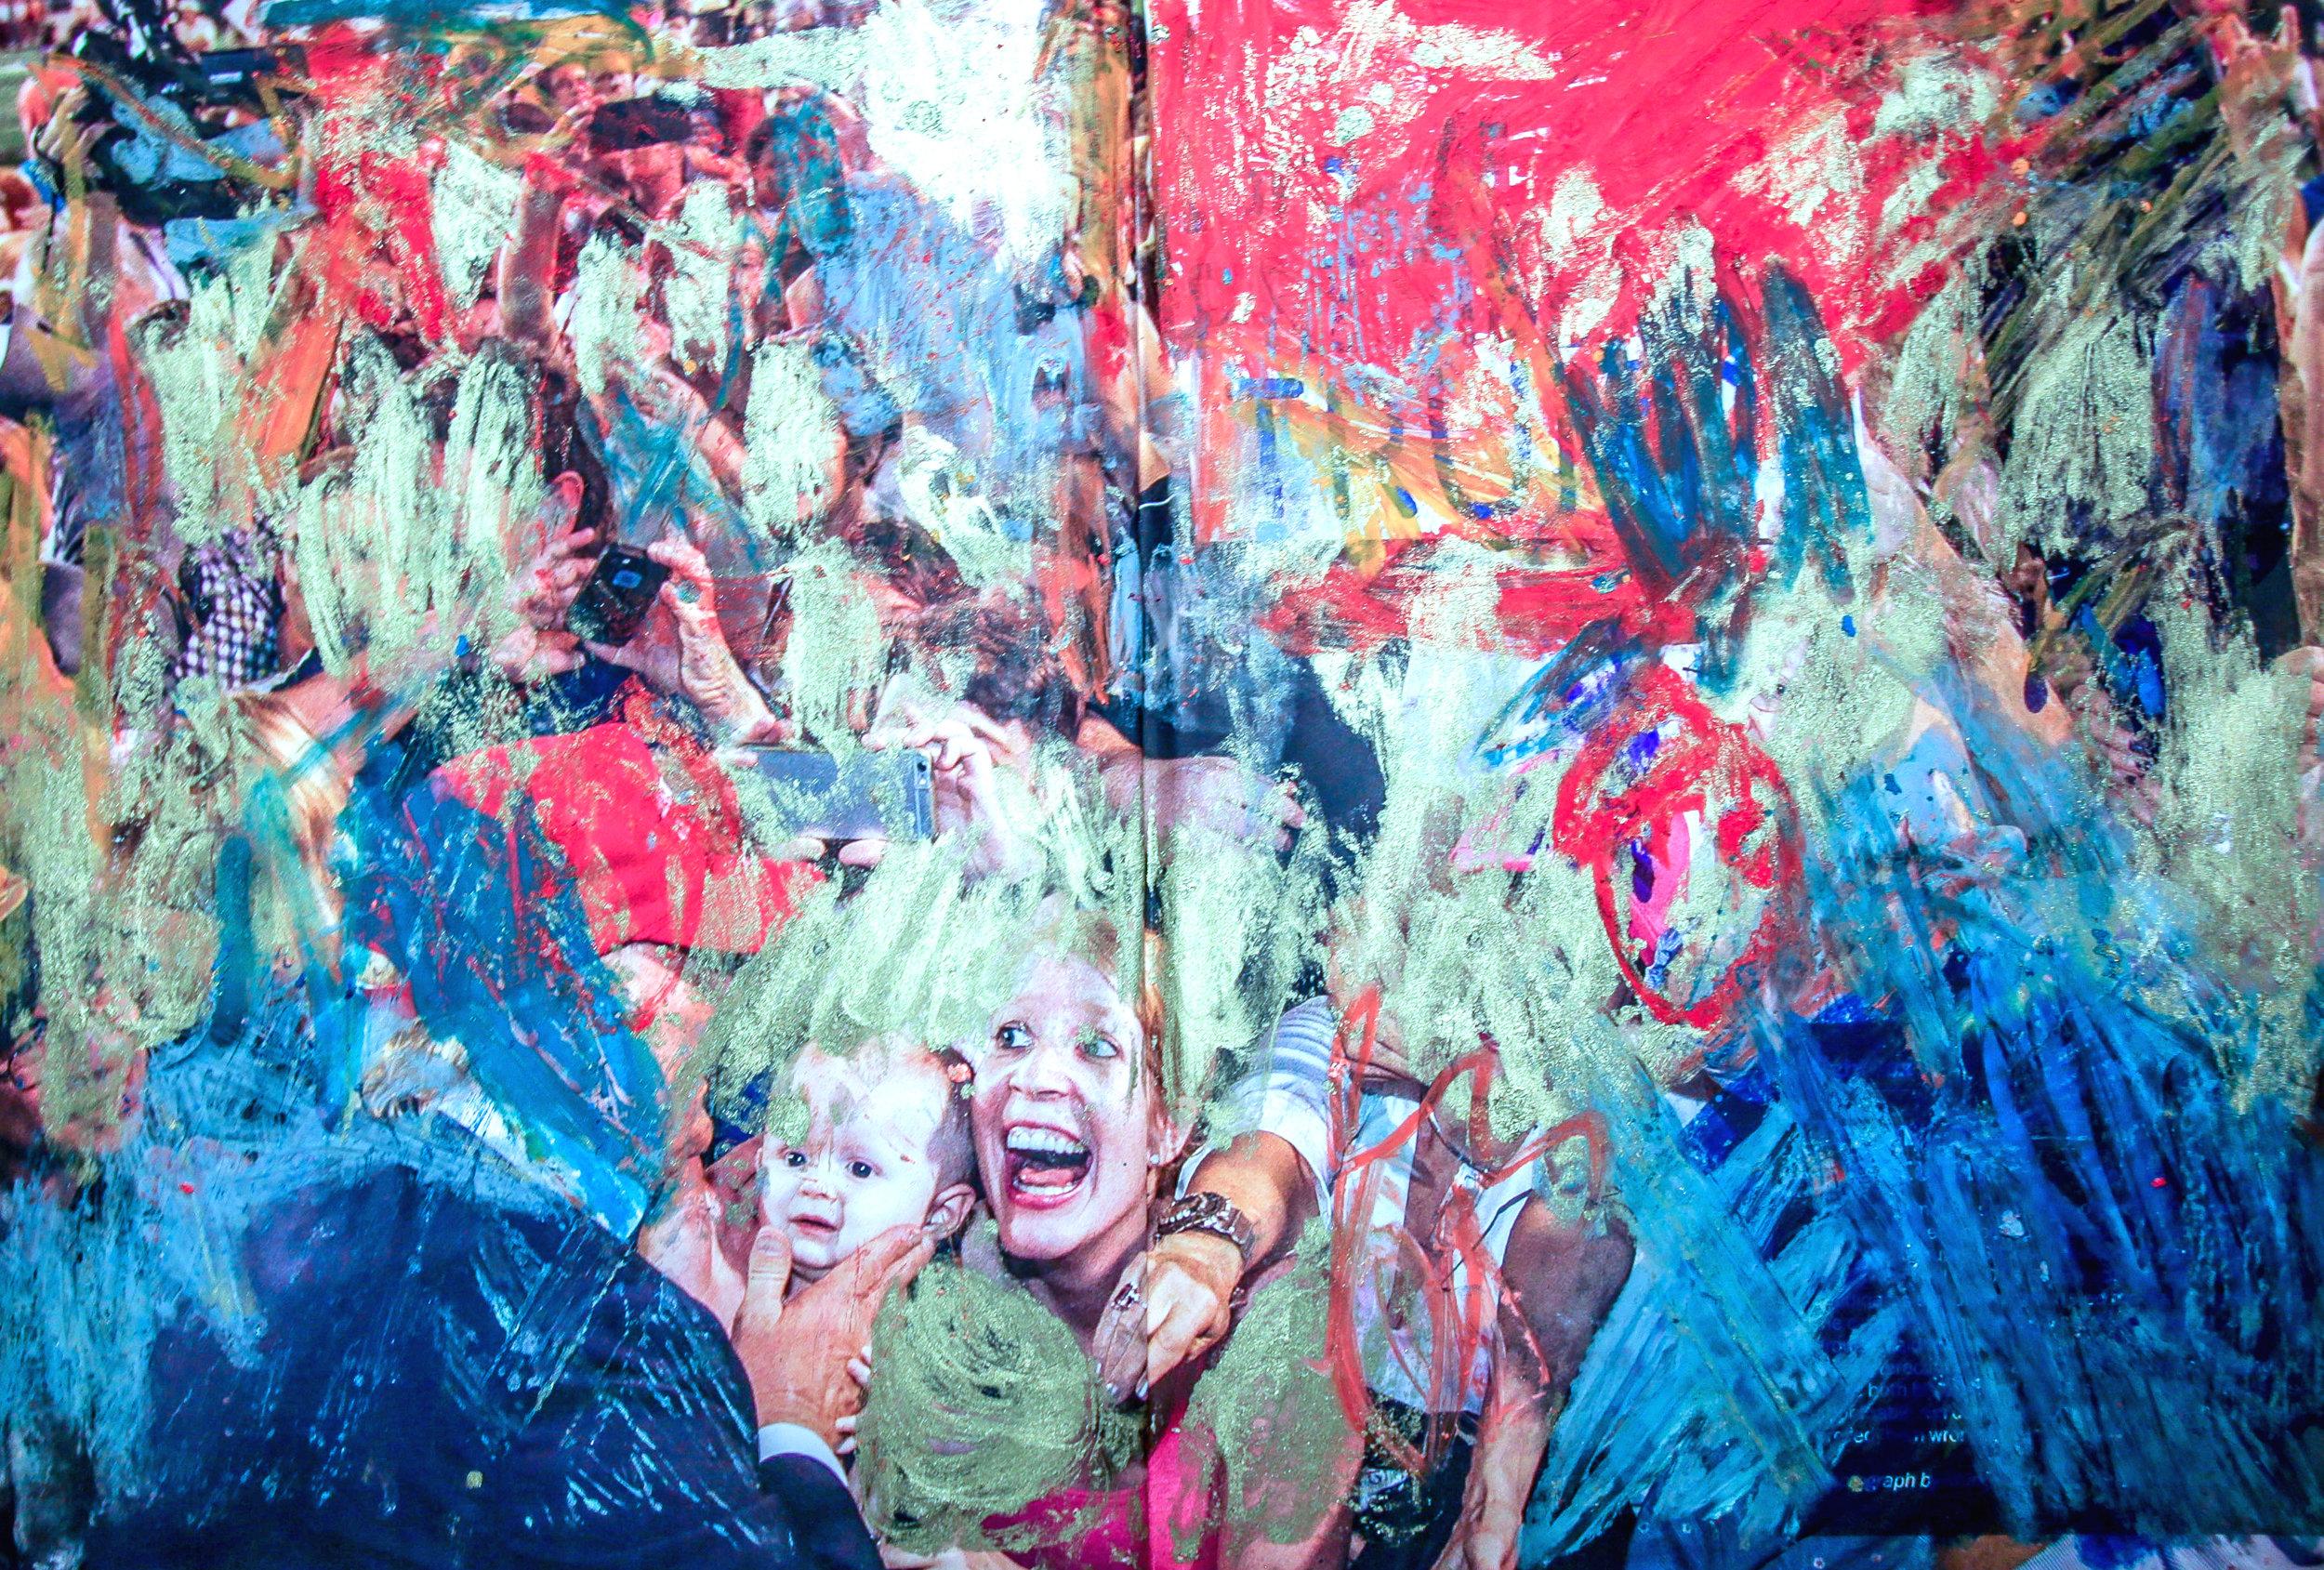 TRU , Sarah Palmeri, 16 x 11 inches, oil on magazine spread, 2016